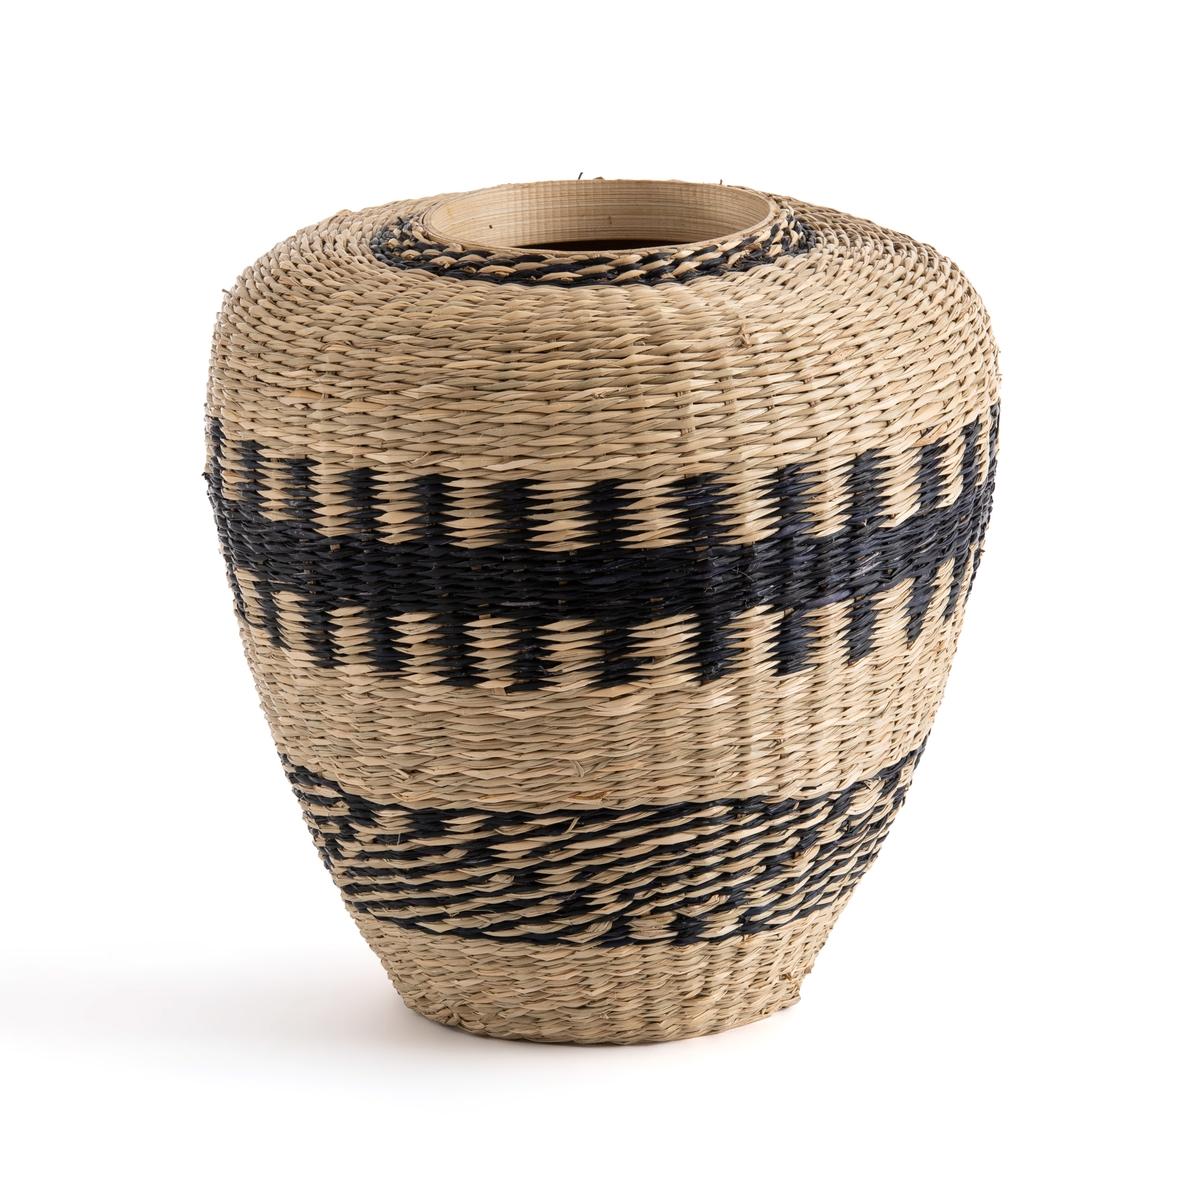 Ваза La Redoute Декоративная из гербария и бамбука Plooming единый размер бежевый ваза декоративная glass moon сфера white 38 см афина